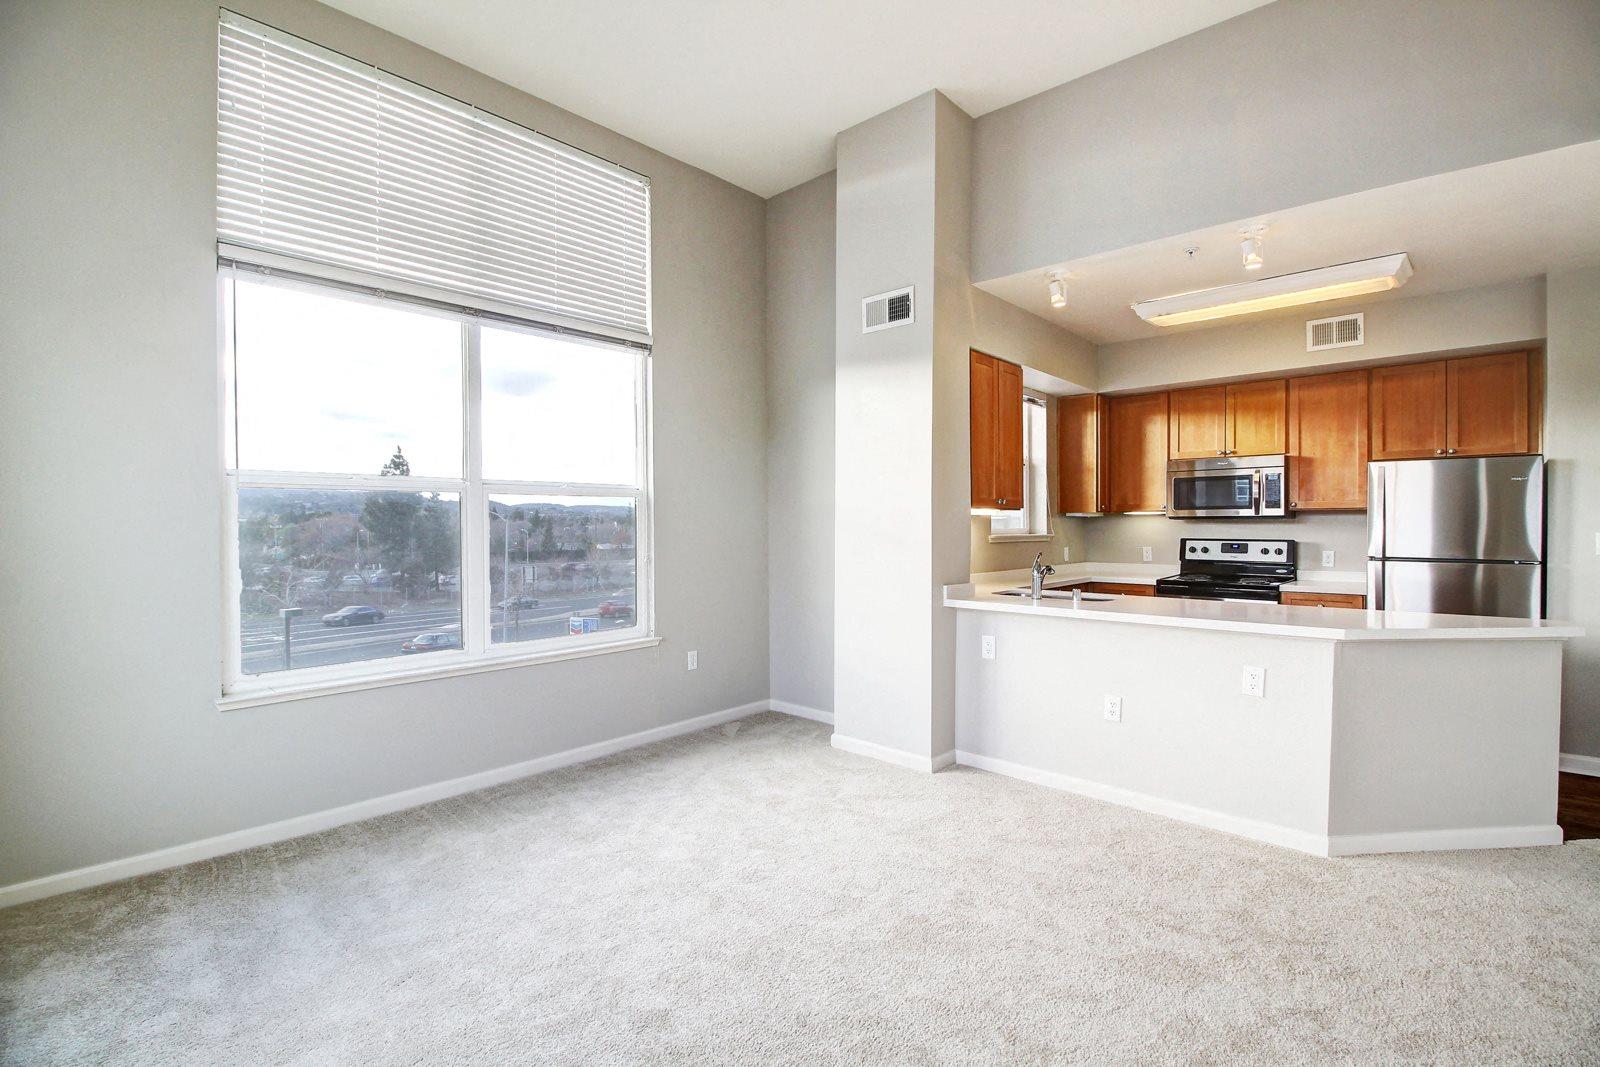 Open Floor Plans With kitchen islands at Villa Montanaro, California